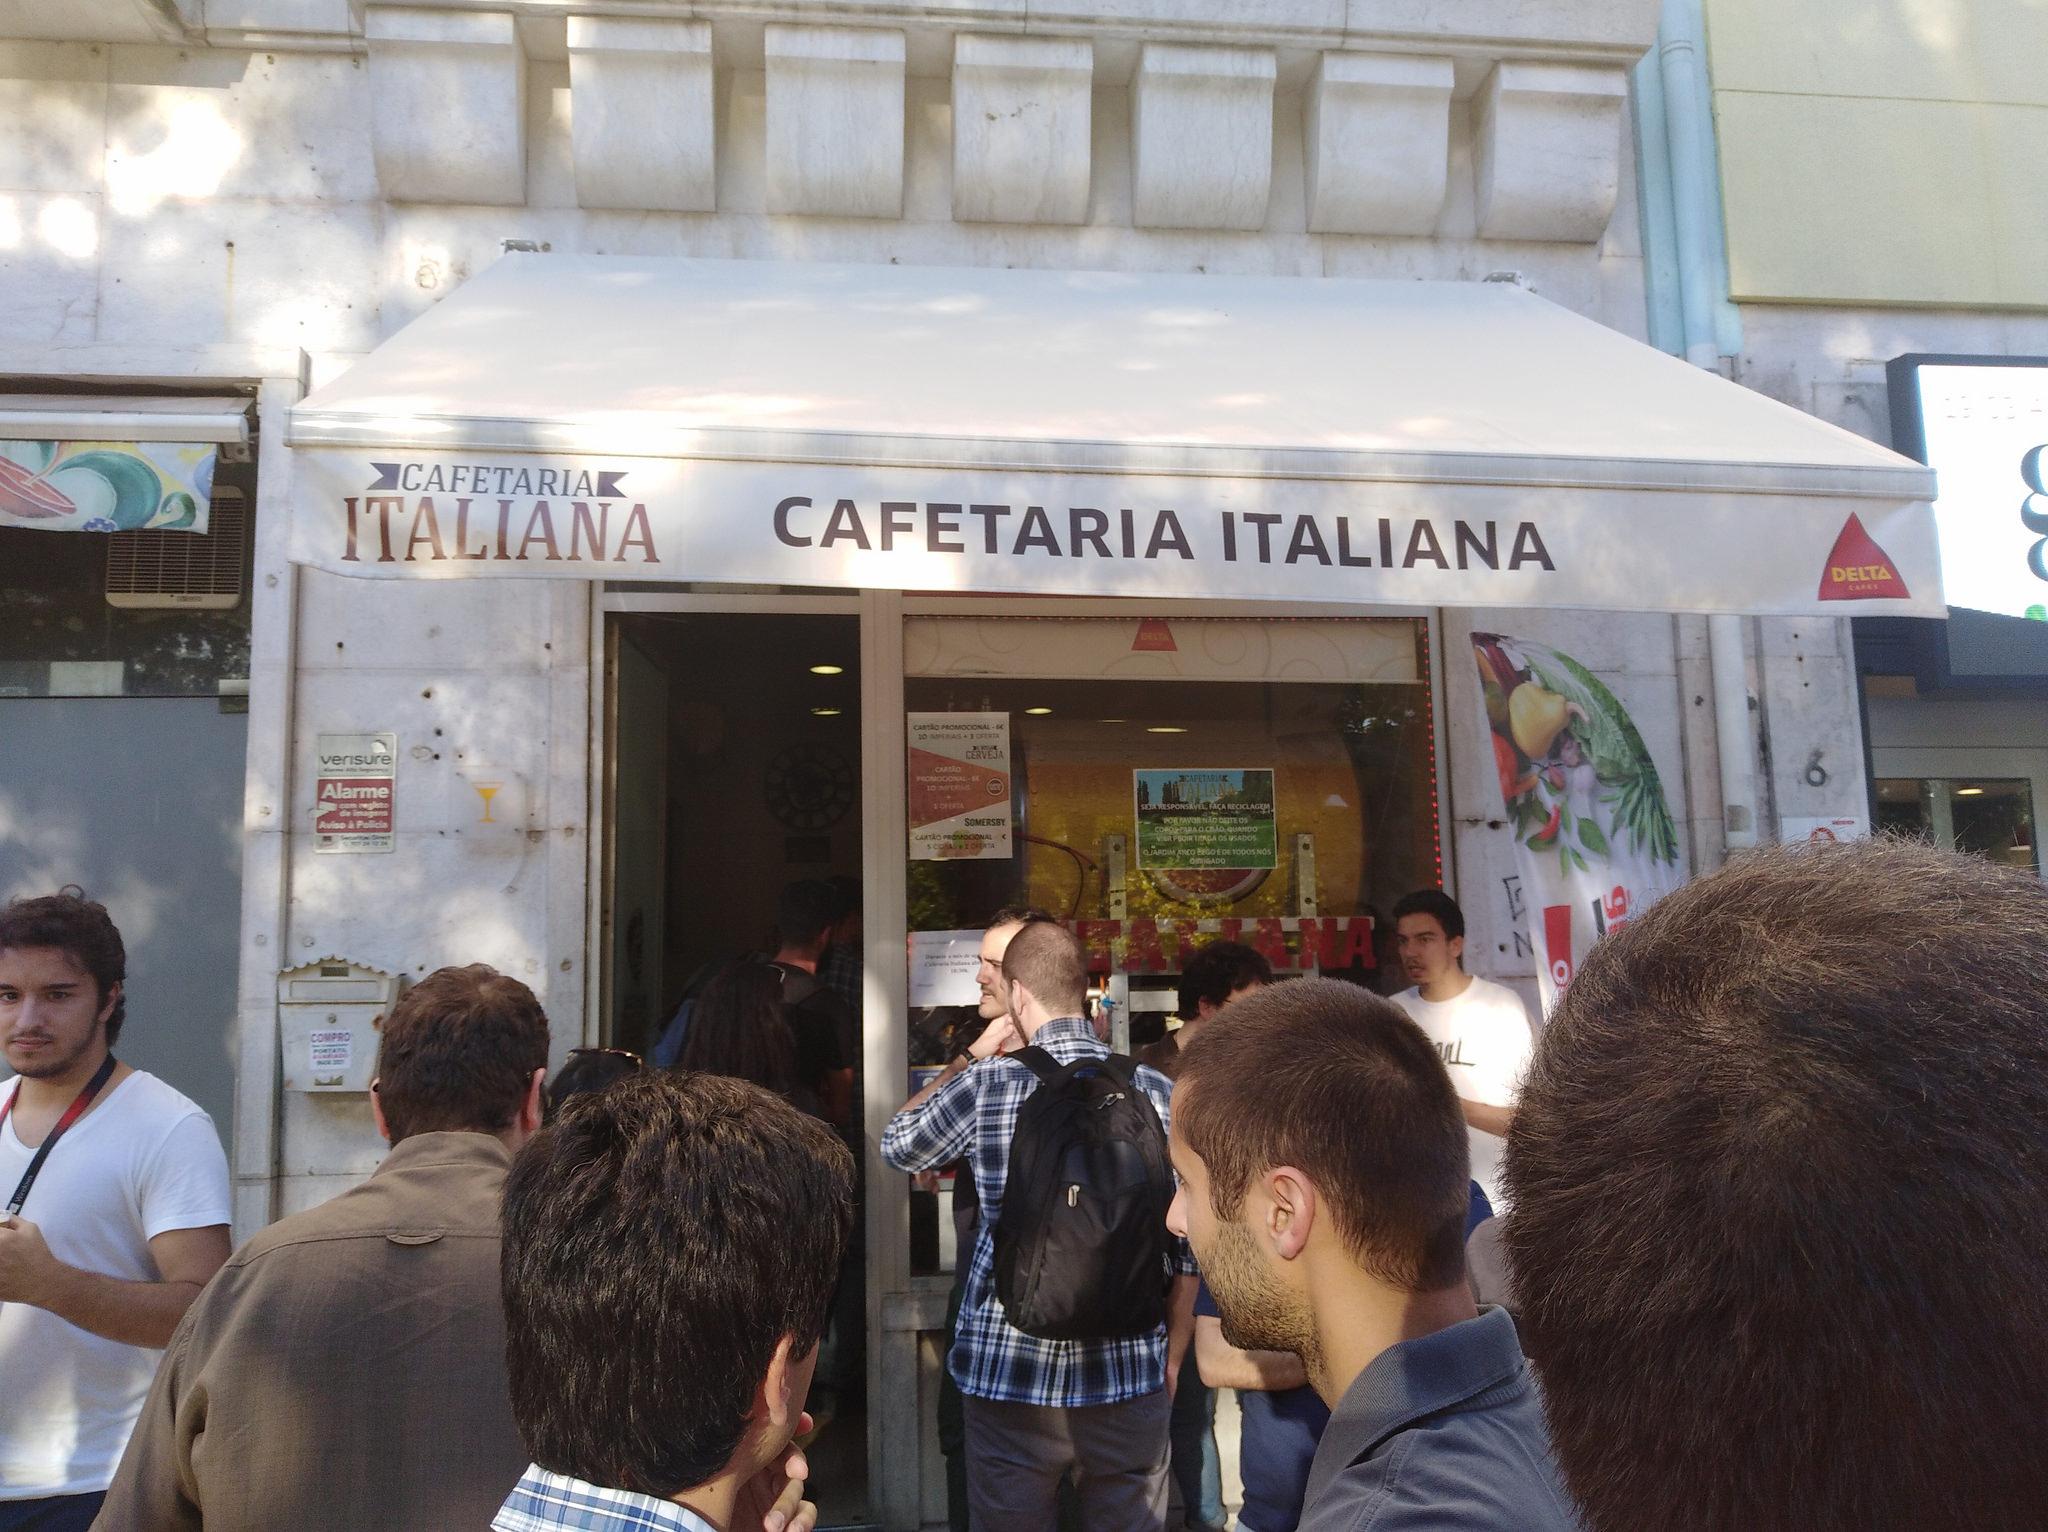 Cafetaria Italia, Arco dos Ciegos